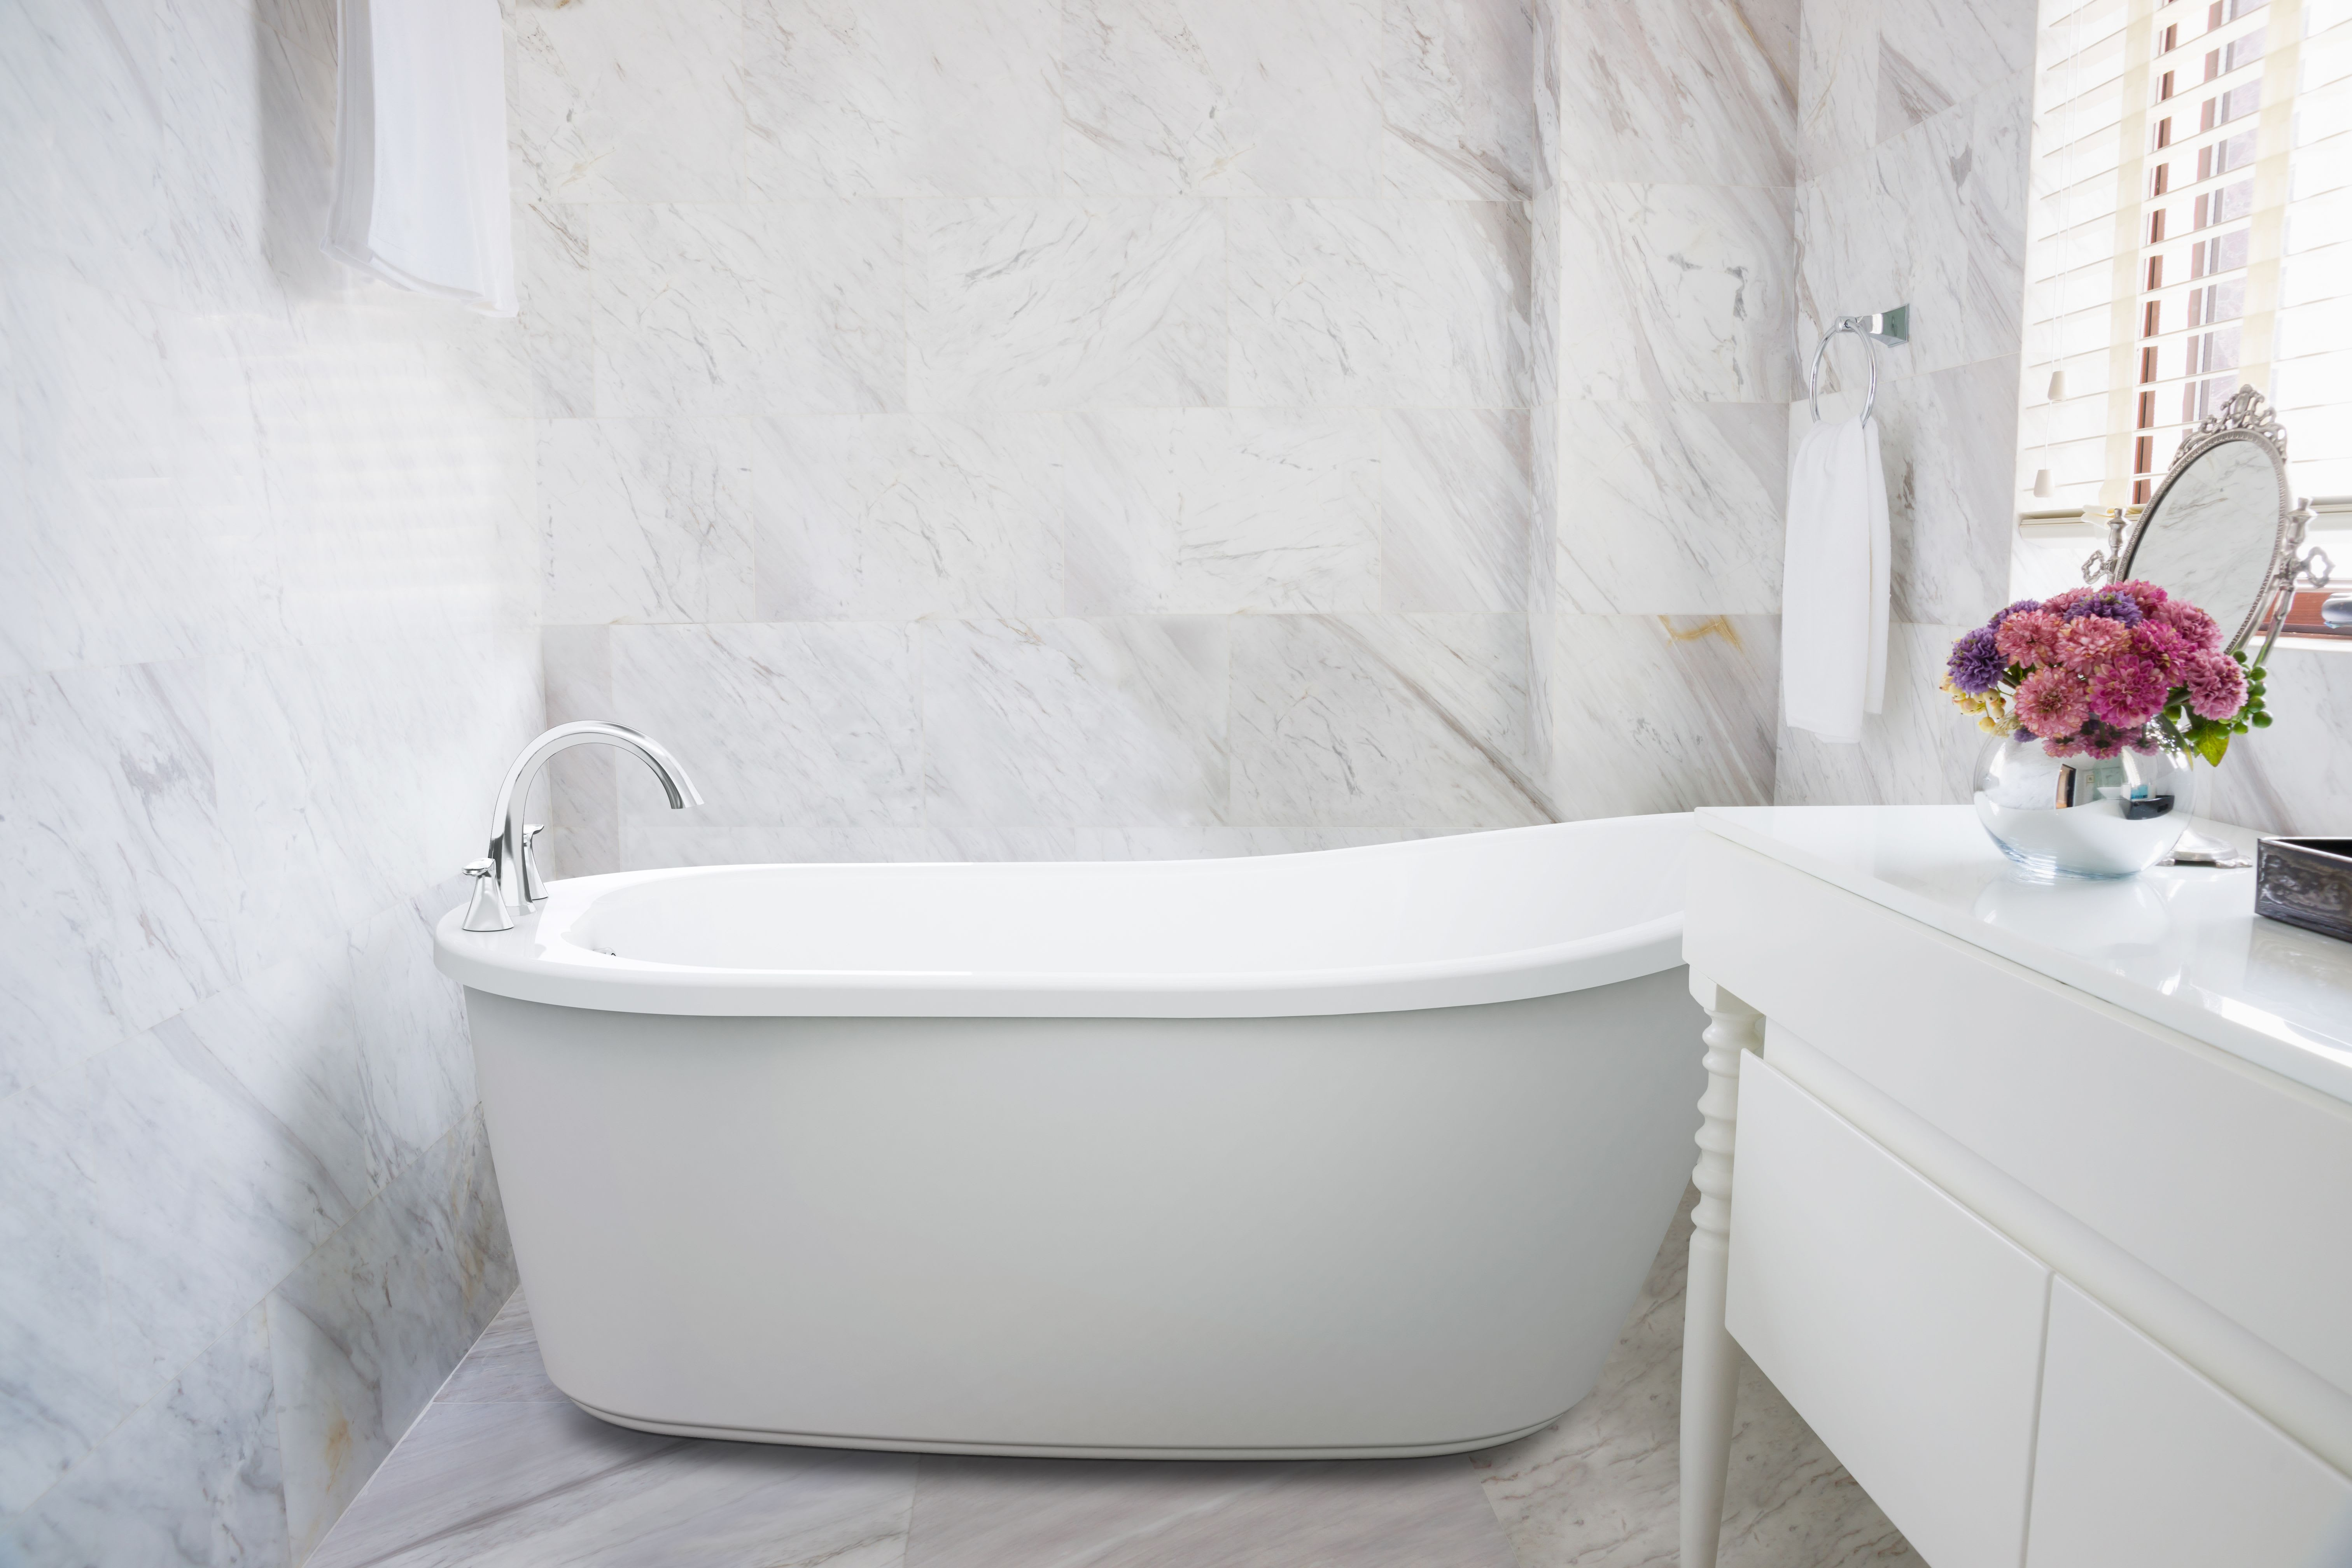 products bathtub megabai soaking inches bai acrylic freestanding